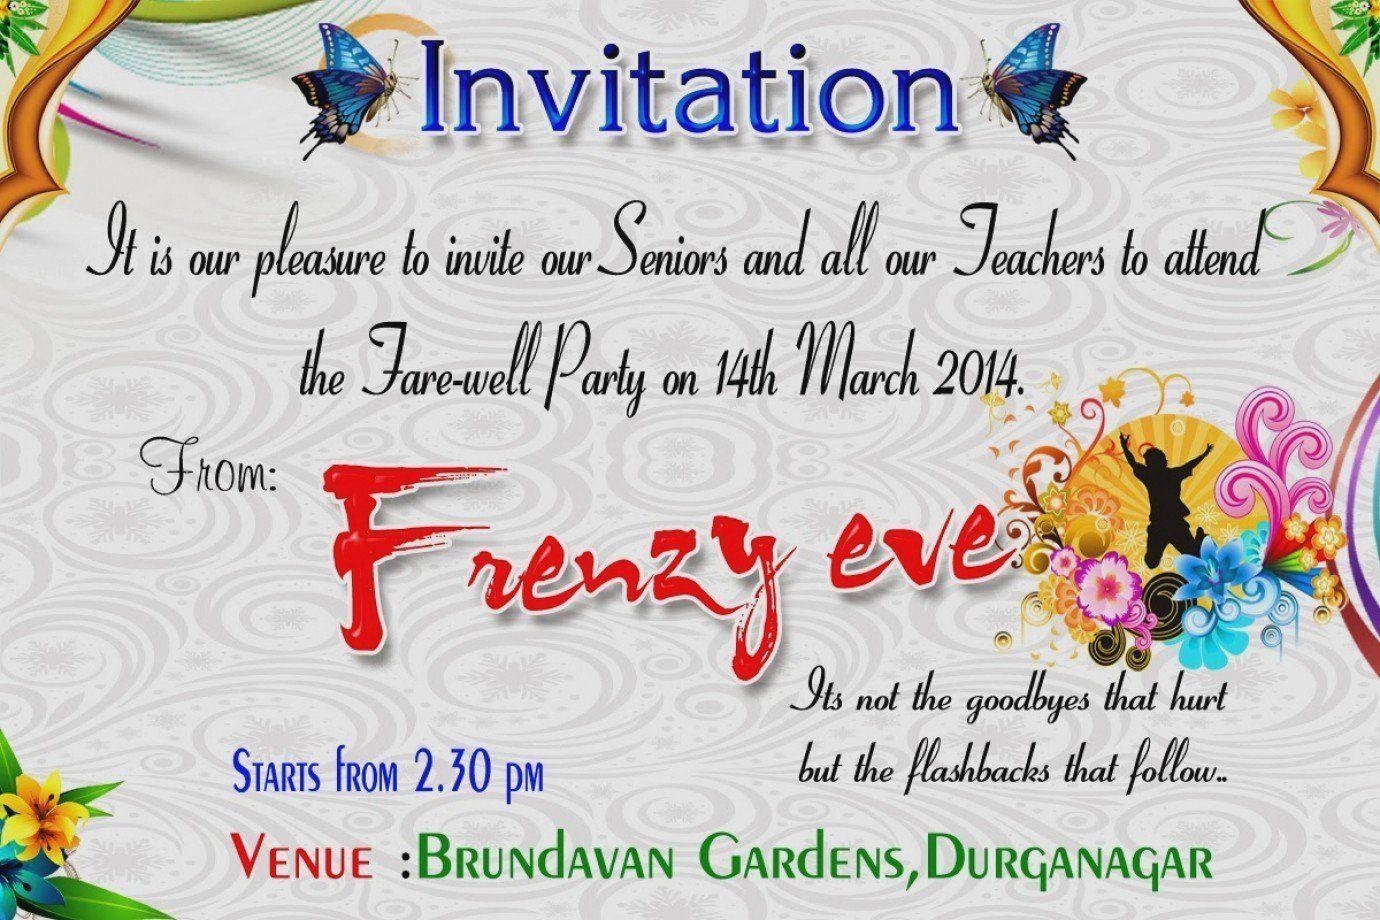 Printable Goodbye Cards Inspirational Farewell Invitation Templates Free Download Lette Farewell Party Invitations Farewell Invitation Card Party Invite Design